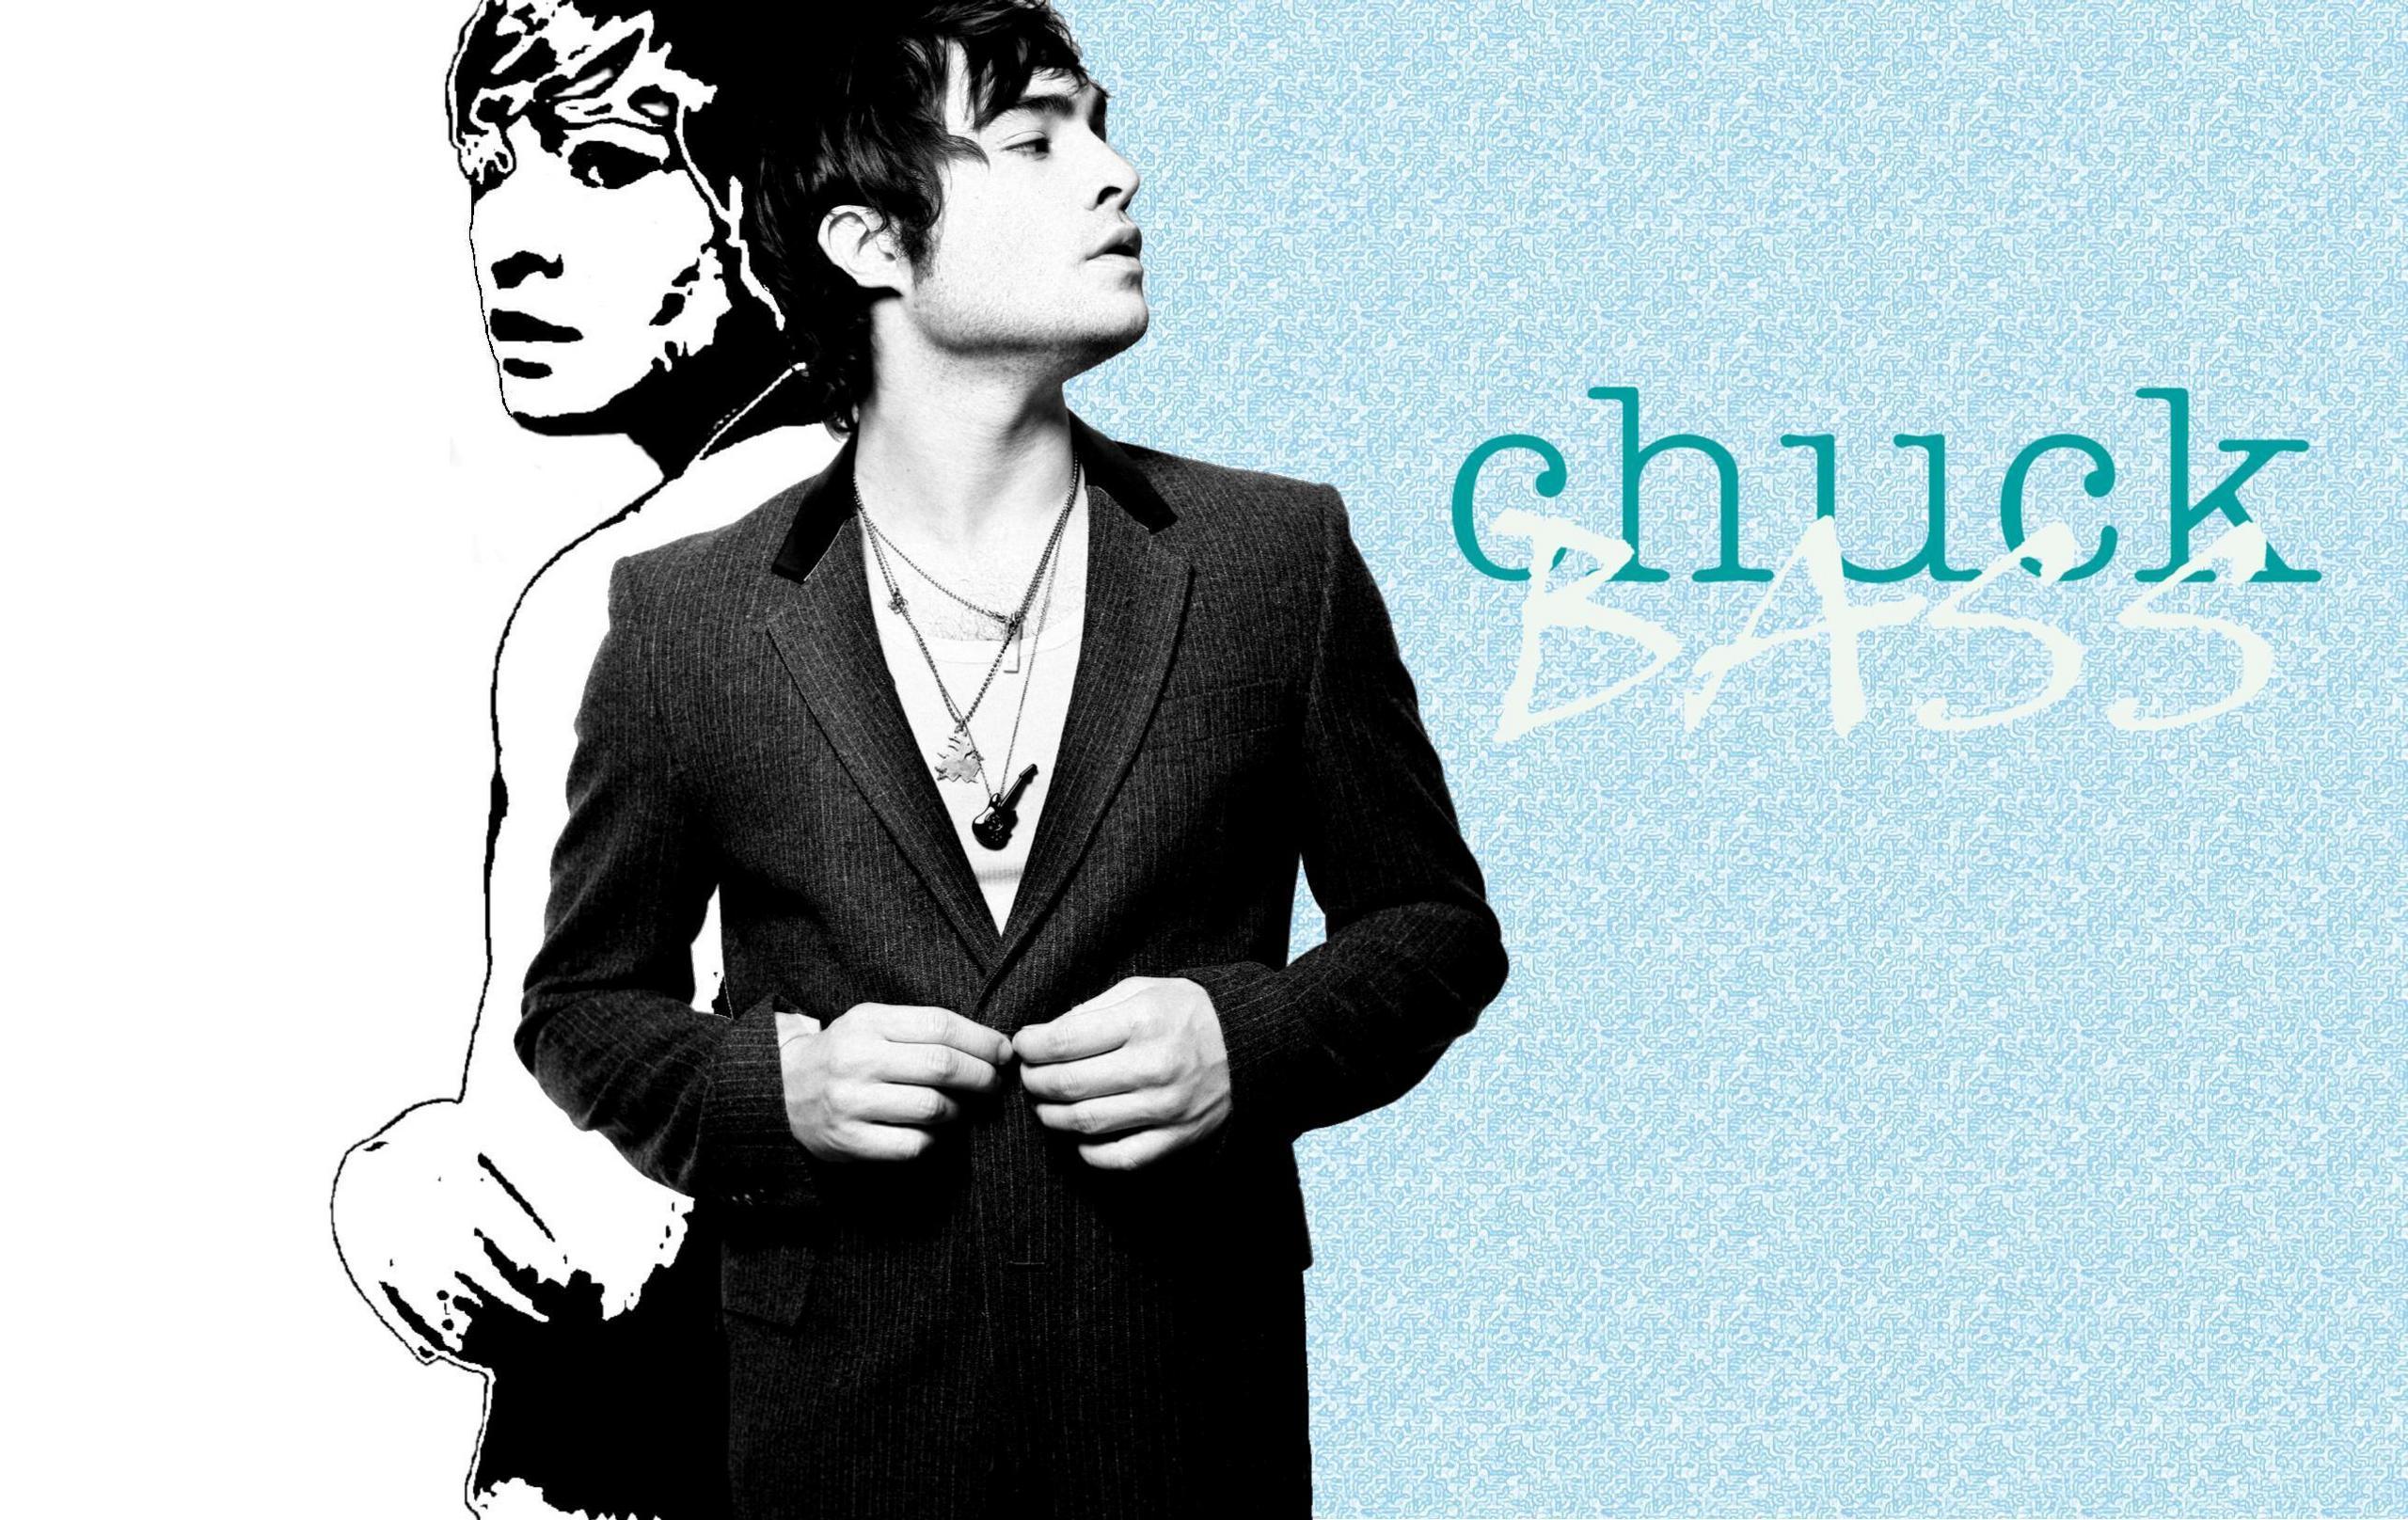 Gossip Girl - Chuck bass - Hintergrund